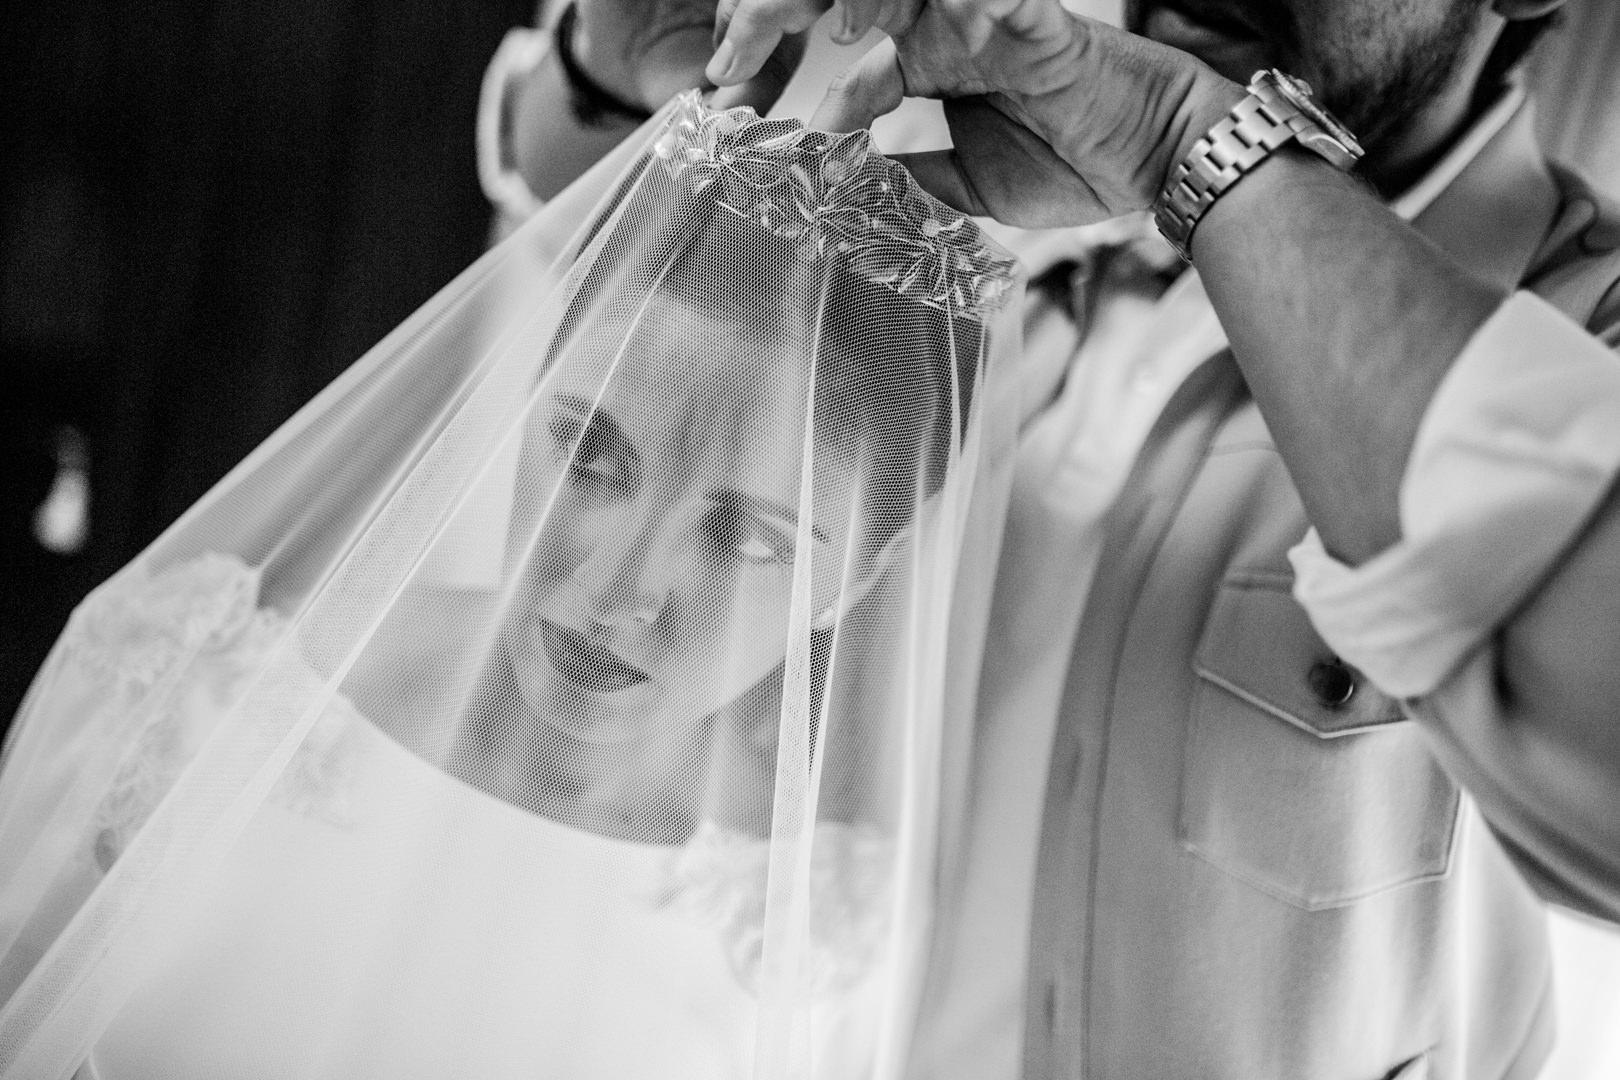 Boda-sevilla-Wedding-engagement-Rafael-Torres-fotografo-bodas-sevilla-madrid-barcelona-wedding-photographer--24.jpg